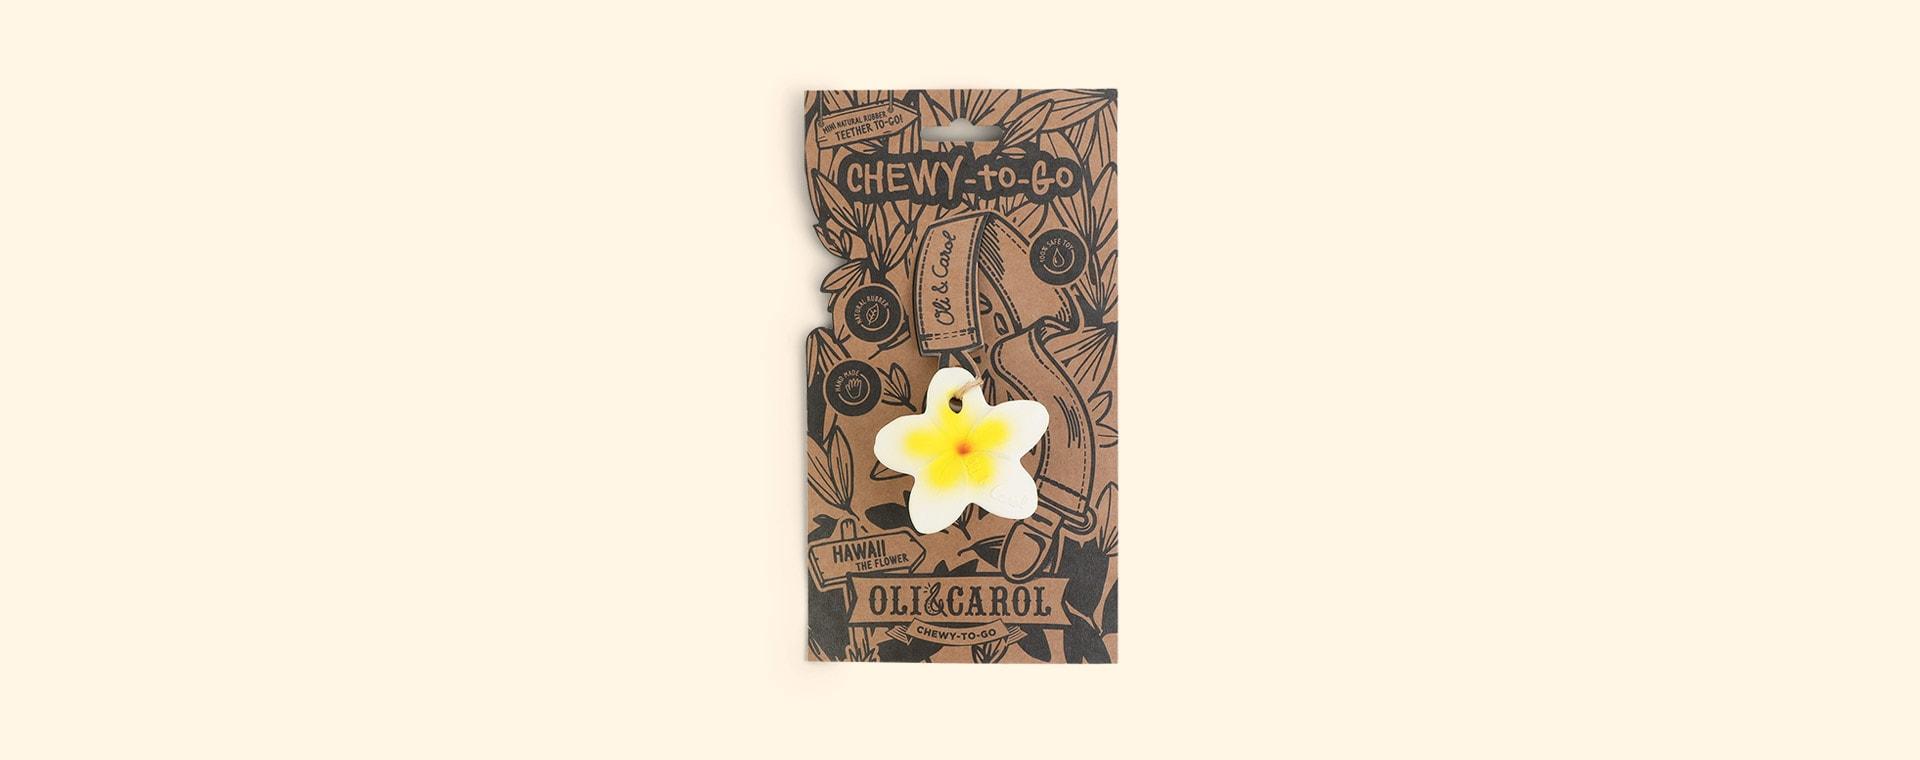 Yellow Oli & Carol Chewy-to-Go Hawaii The Flower